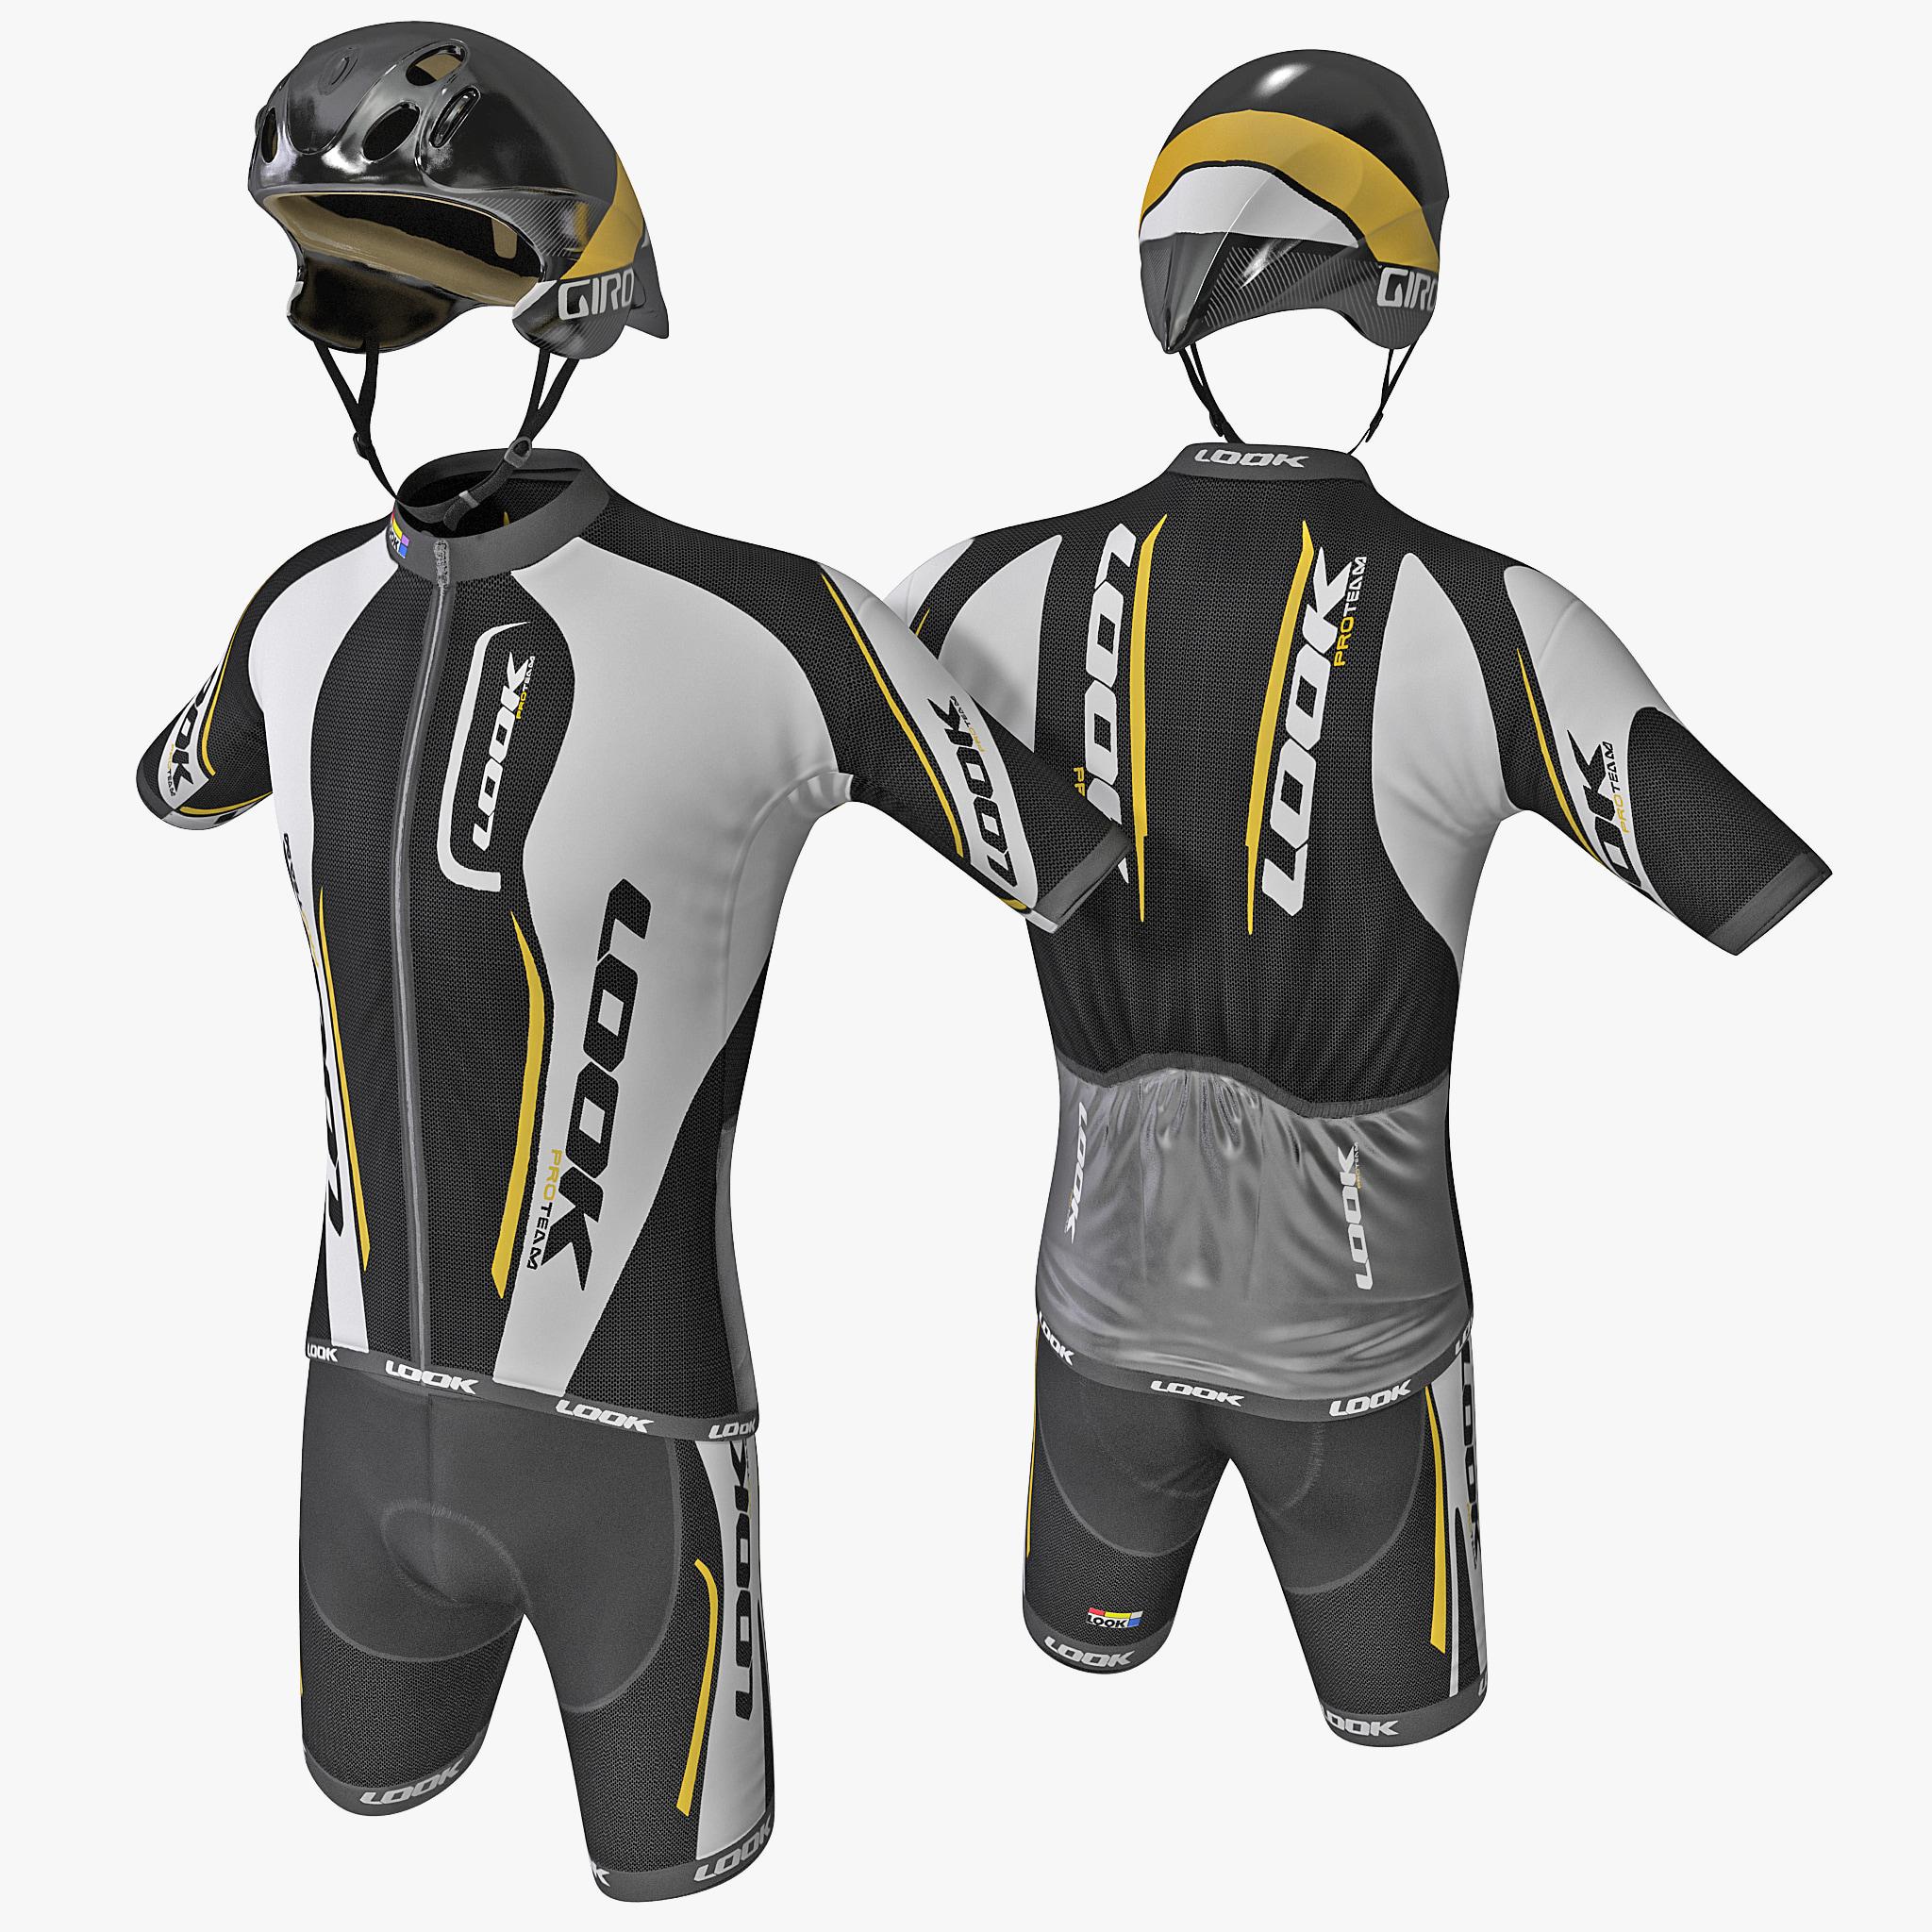 Racing Cyclist Clothes 2_1.jpg